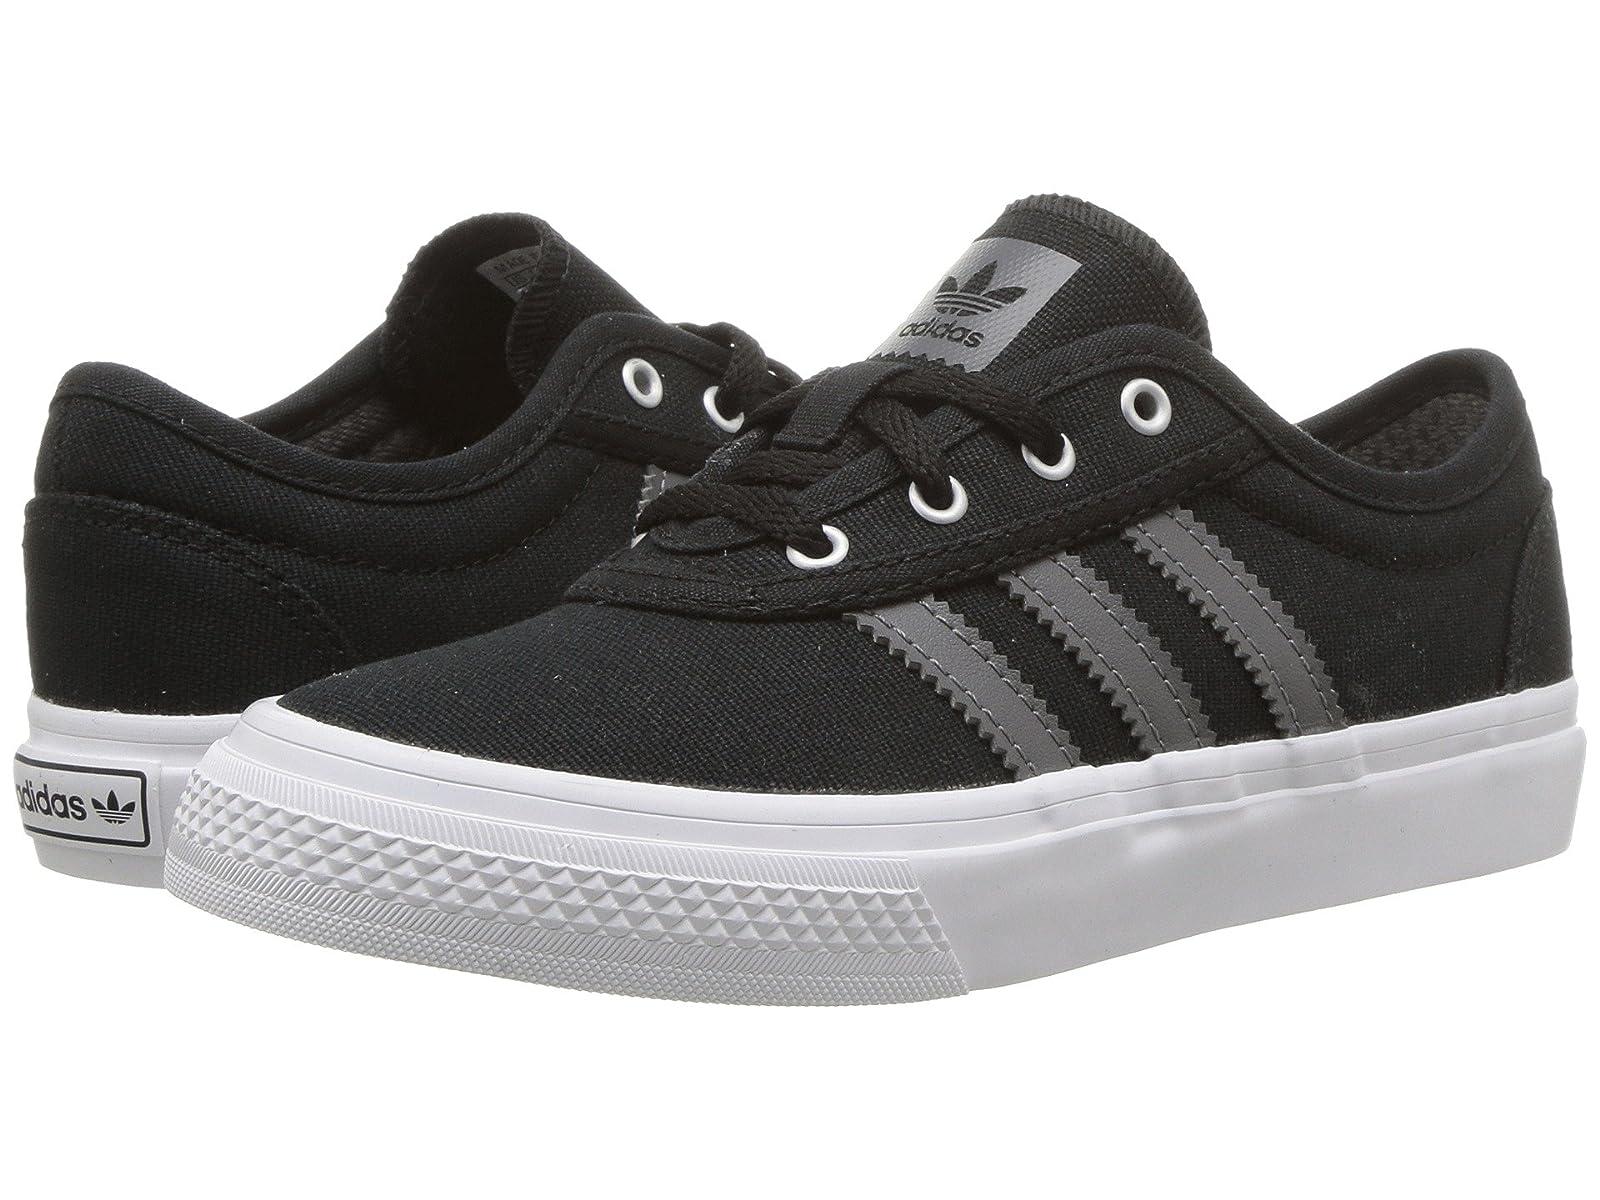 adidas Skateboarding Adi-Ease J (Little Kid/Big Kid)Atmospheric grades have affordable shoes